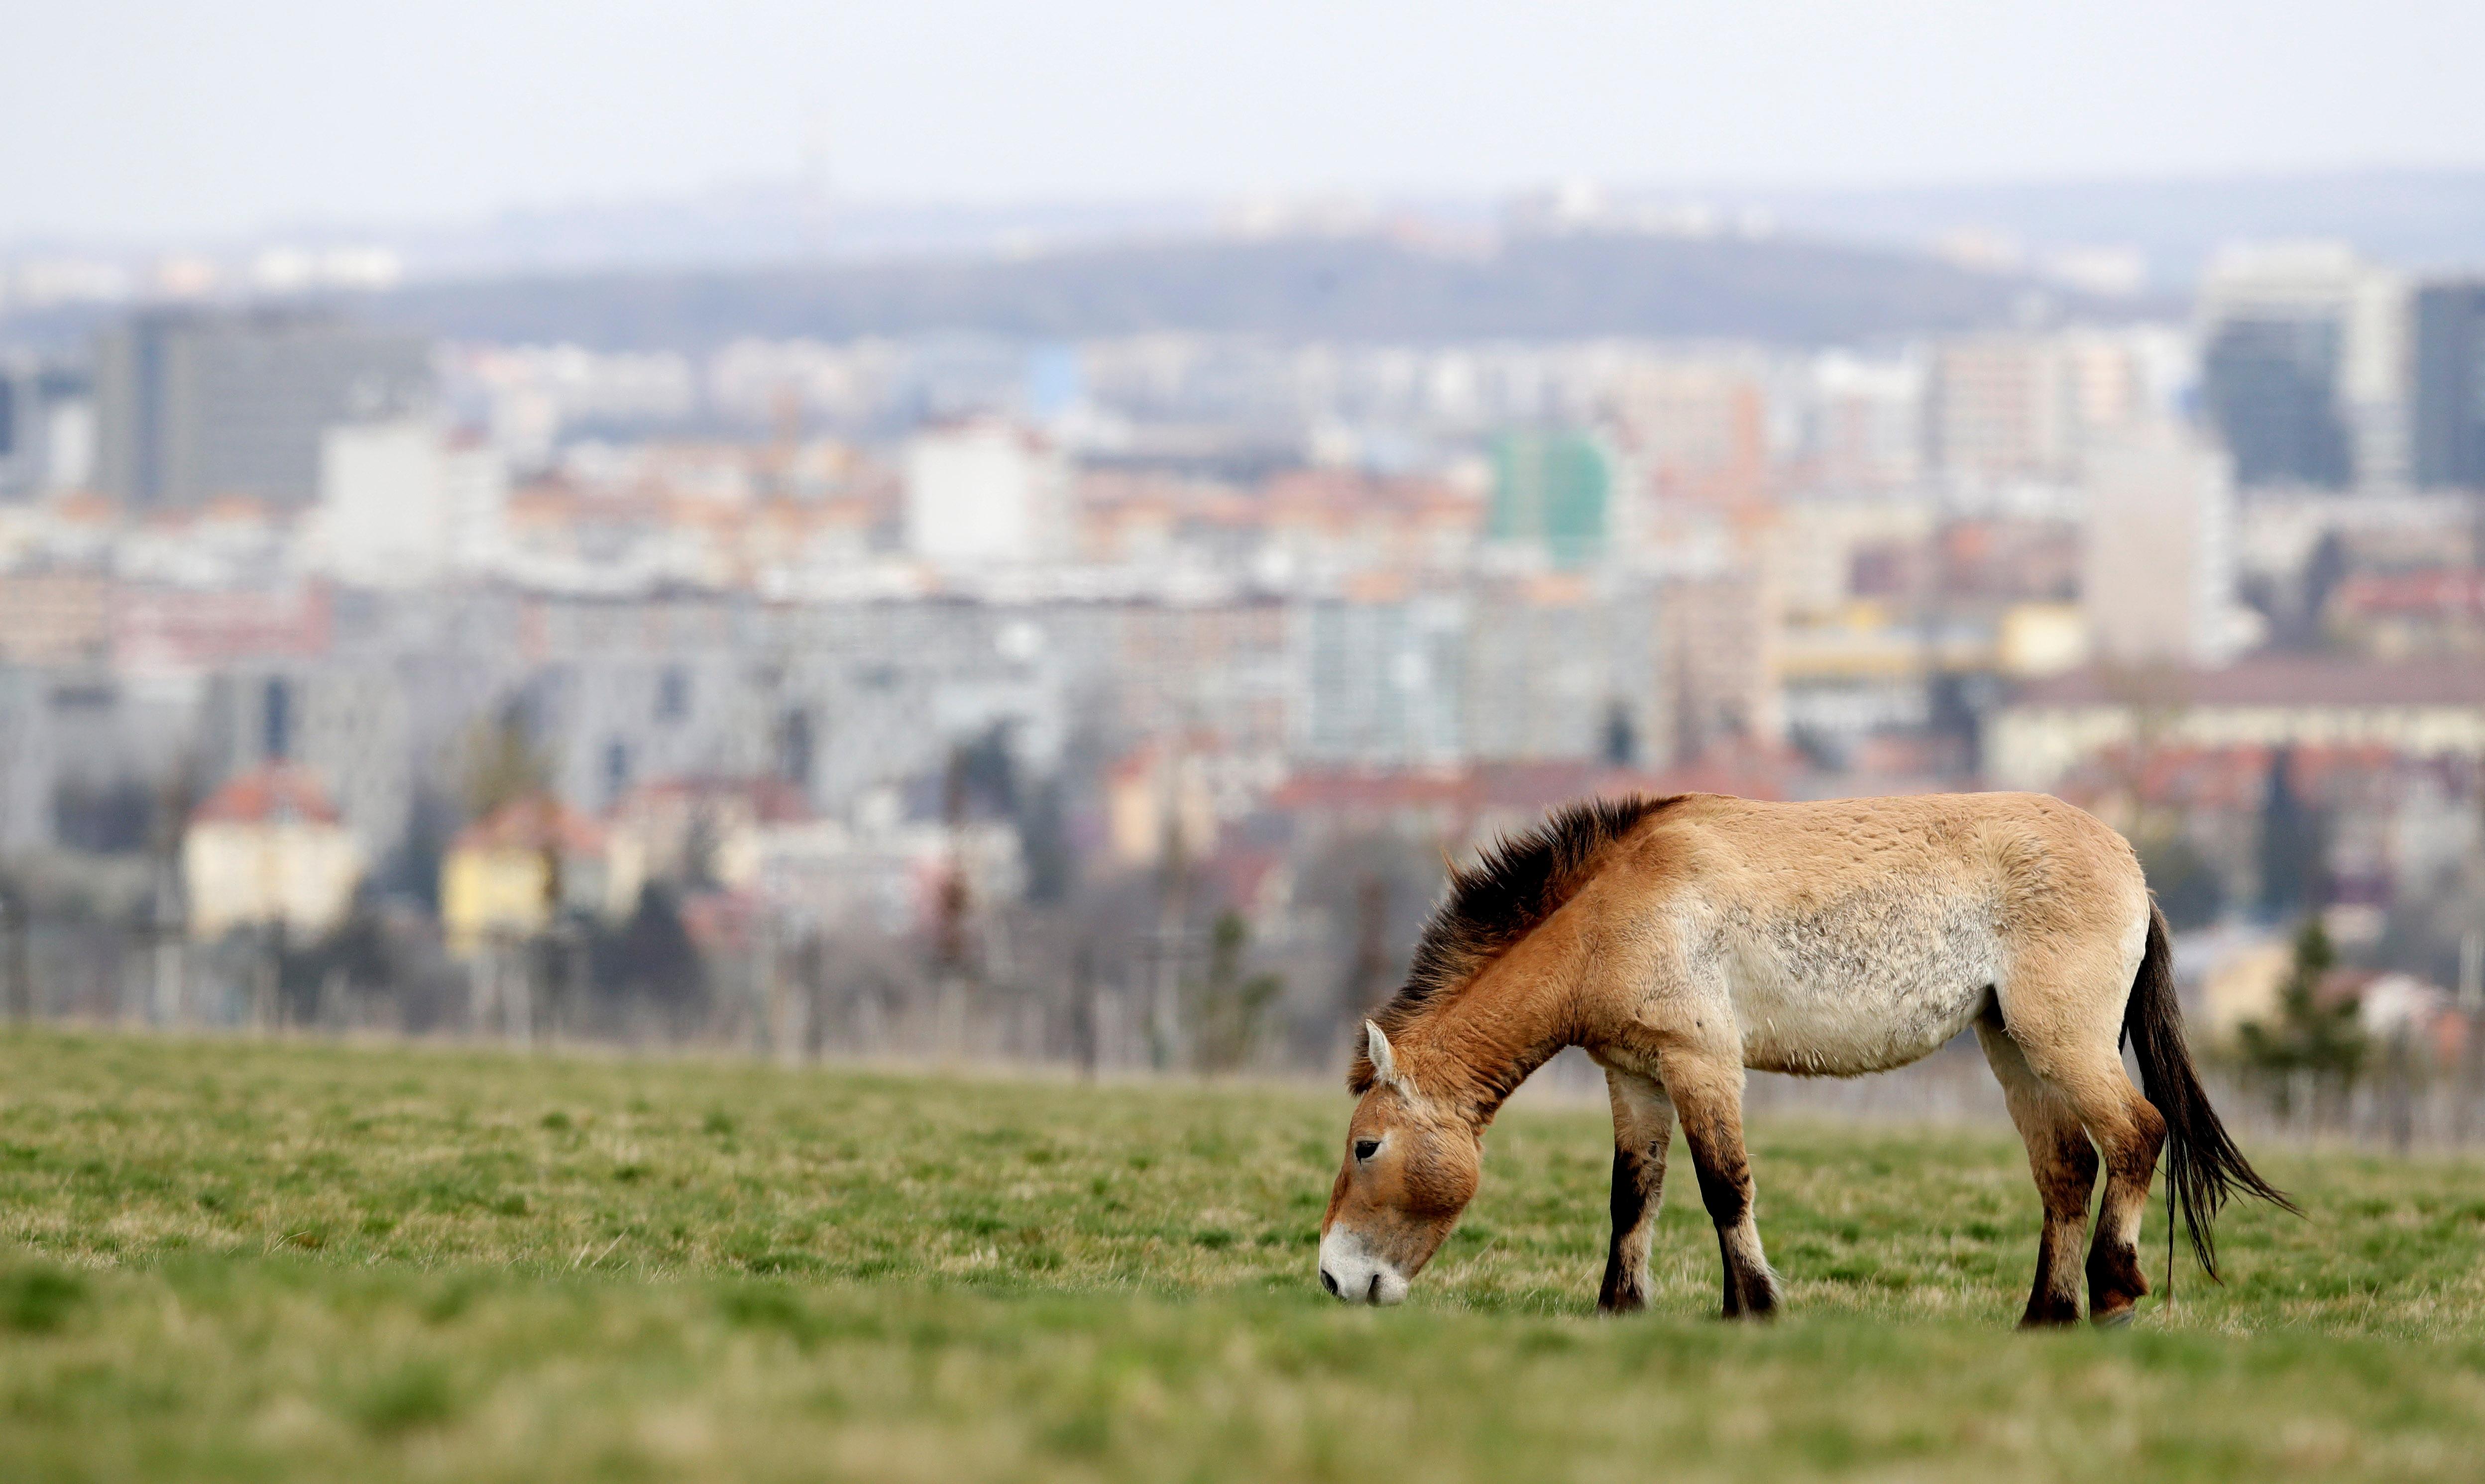 An endangered Przewalski's horse grazes on a meadow inside of a breeding enclosure in Prague, Czech Republic, April 22, 2021.  REUTERS/David W Cerny